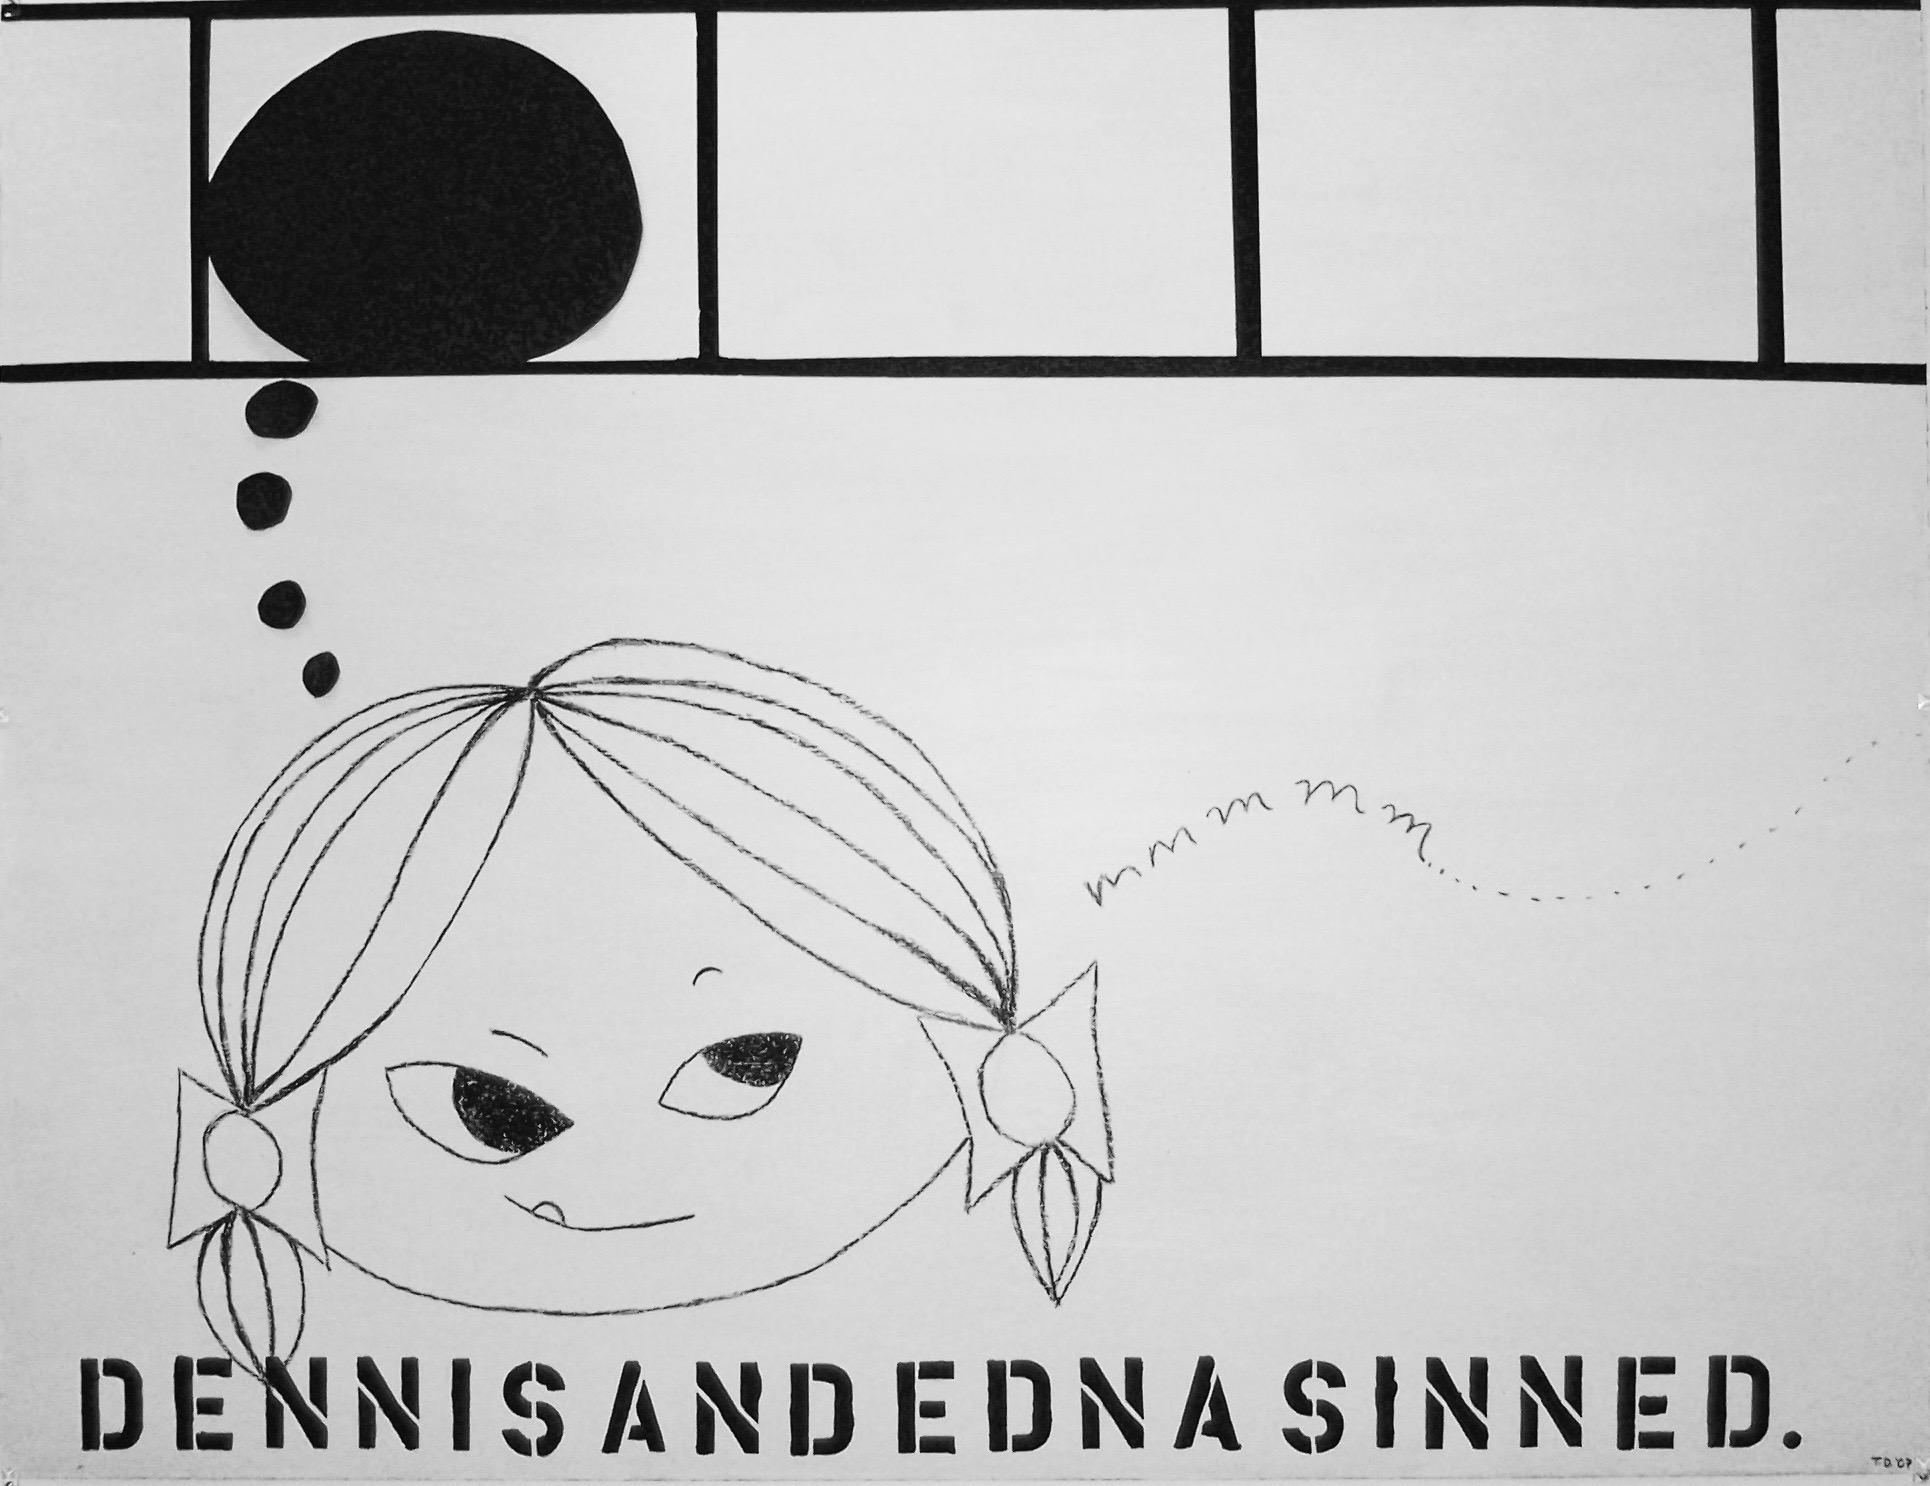 DENNIS AND EDNA SINNED